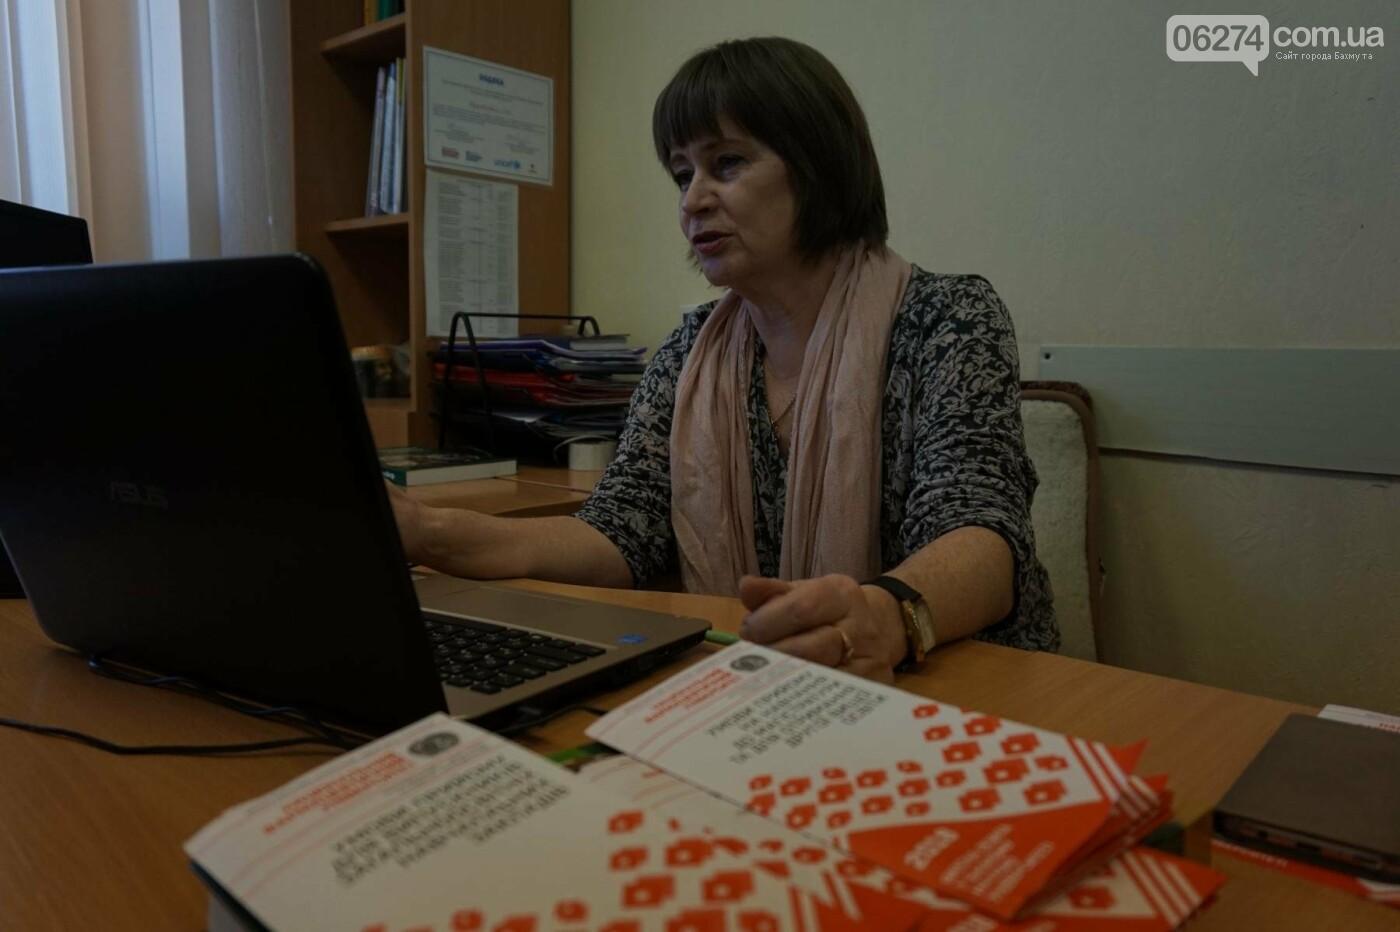 Харьковский фармуниверситет провел презентацию для абитуриентов Бахмута, фото-1